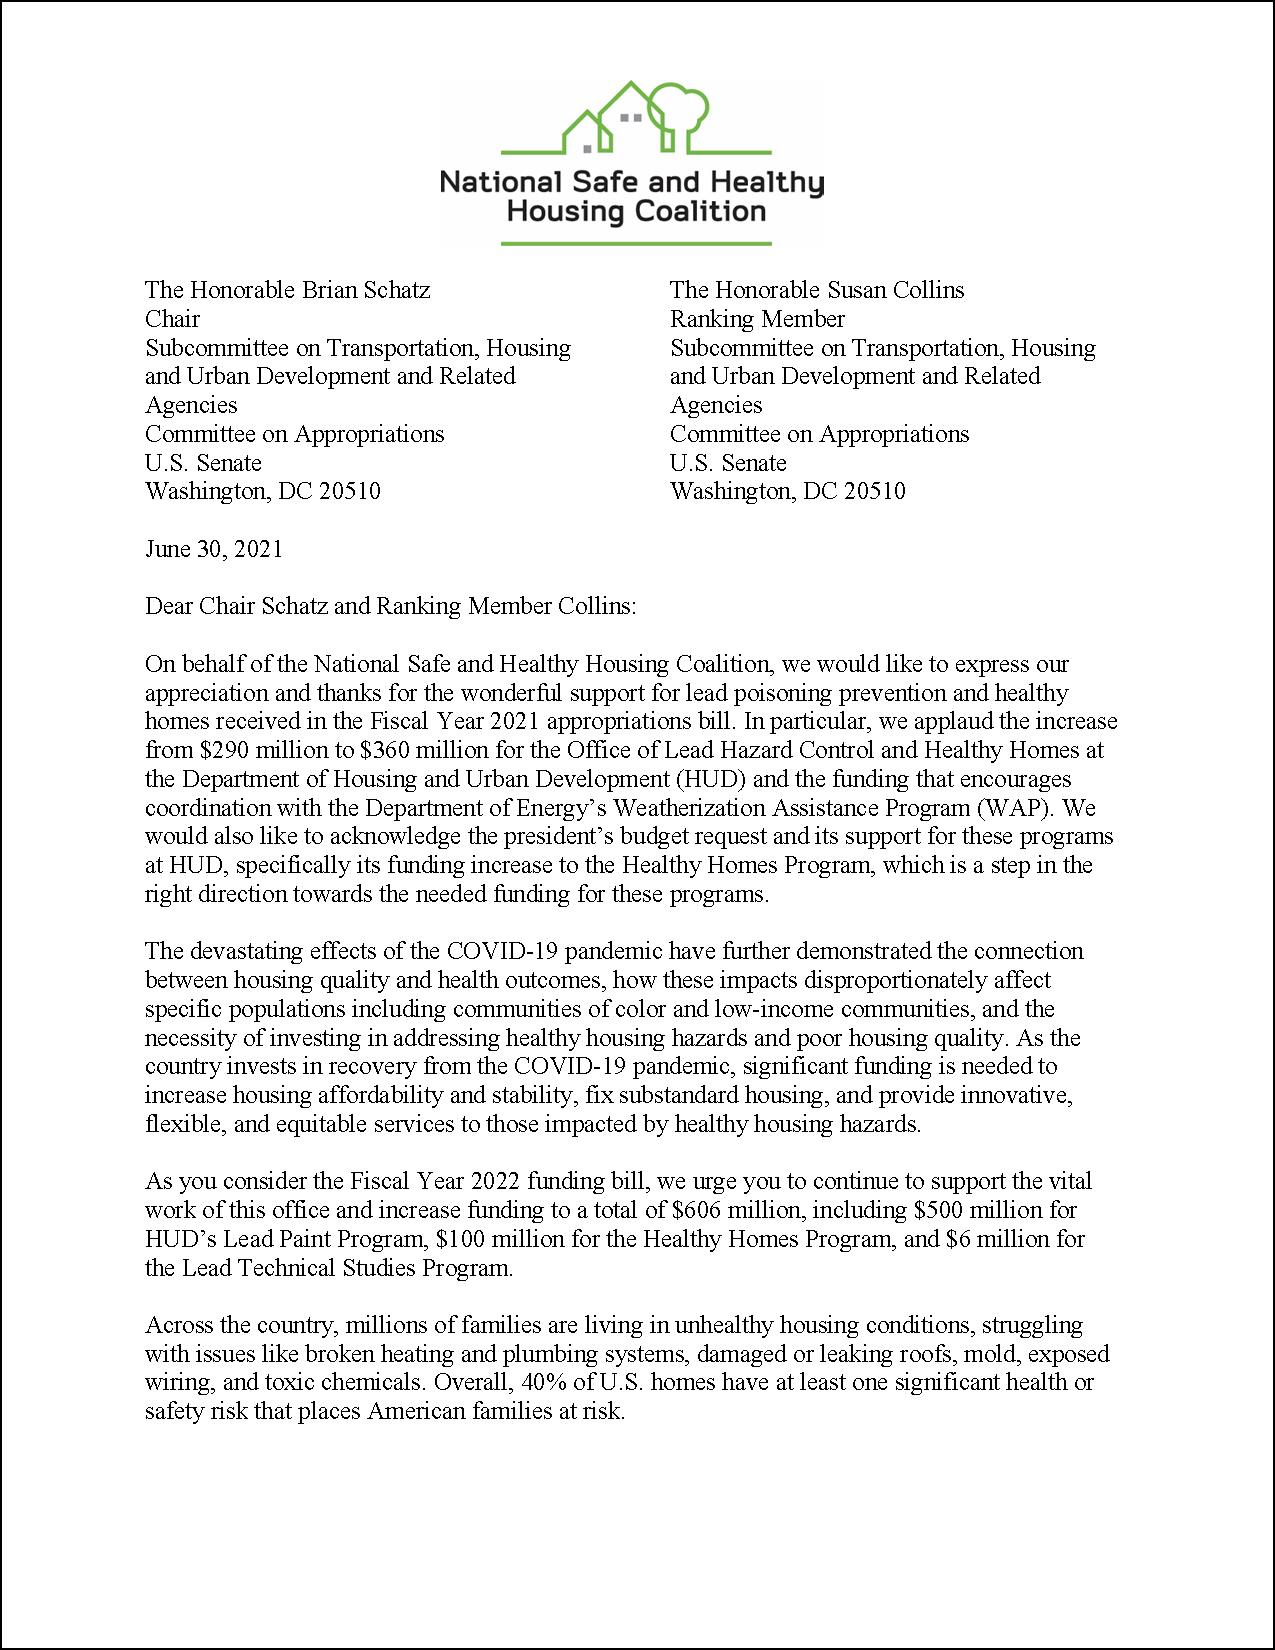 Letter: FY22 Appropriations to U.S. Senate: HUD Programs [2021.06.30] [NSHHC]